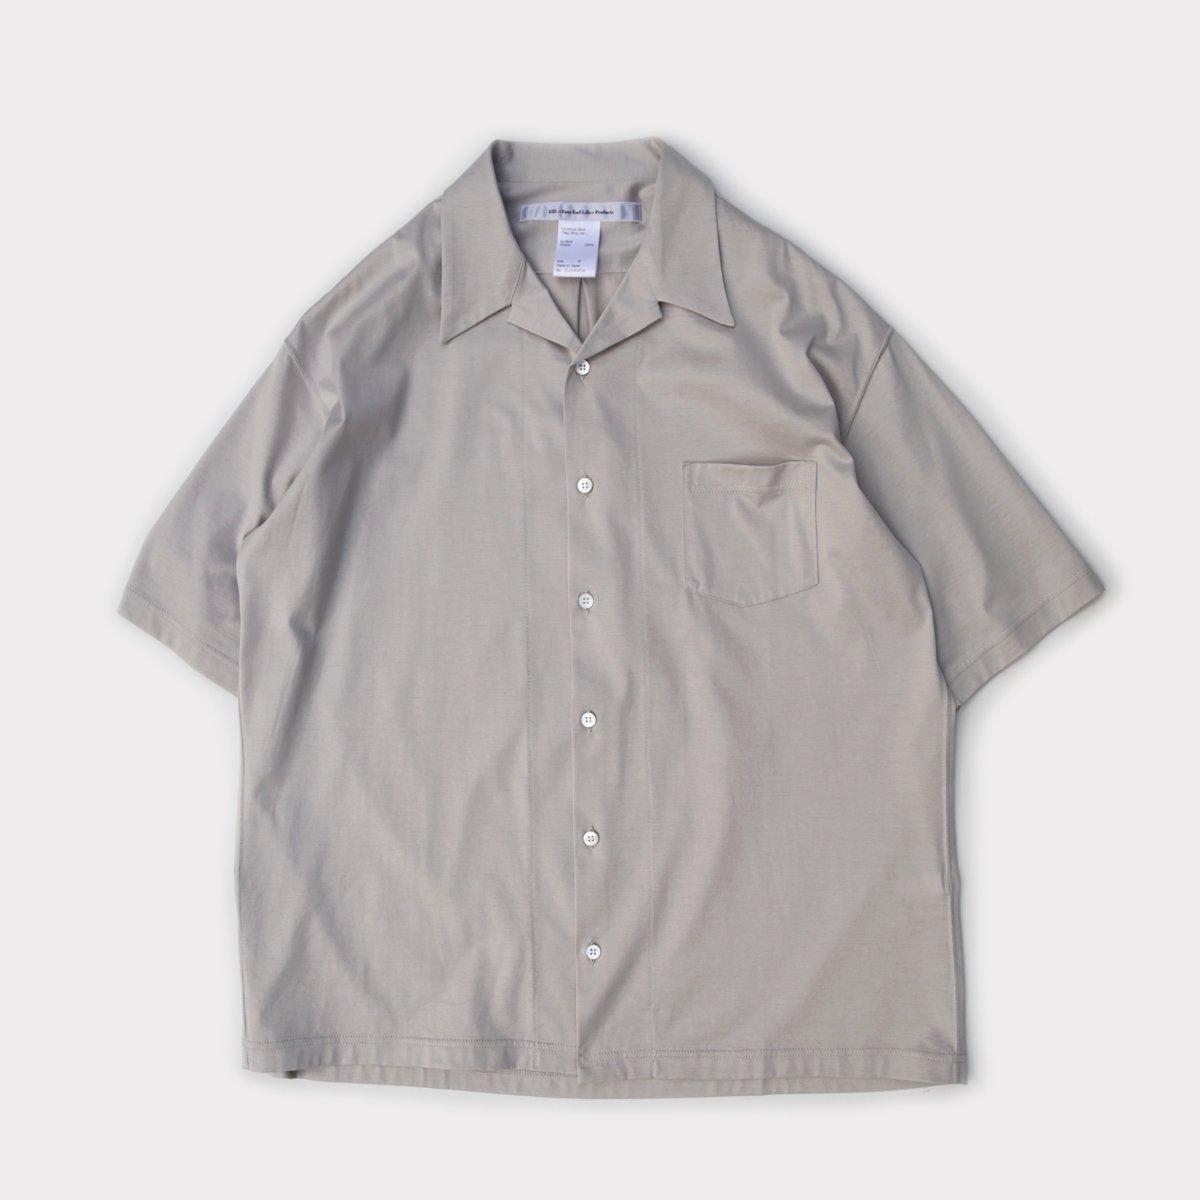 Coconuts Shirt Flag Shop Ver.  Graige